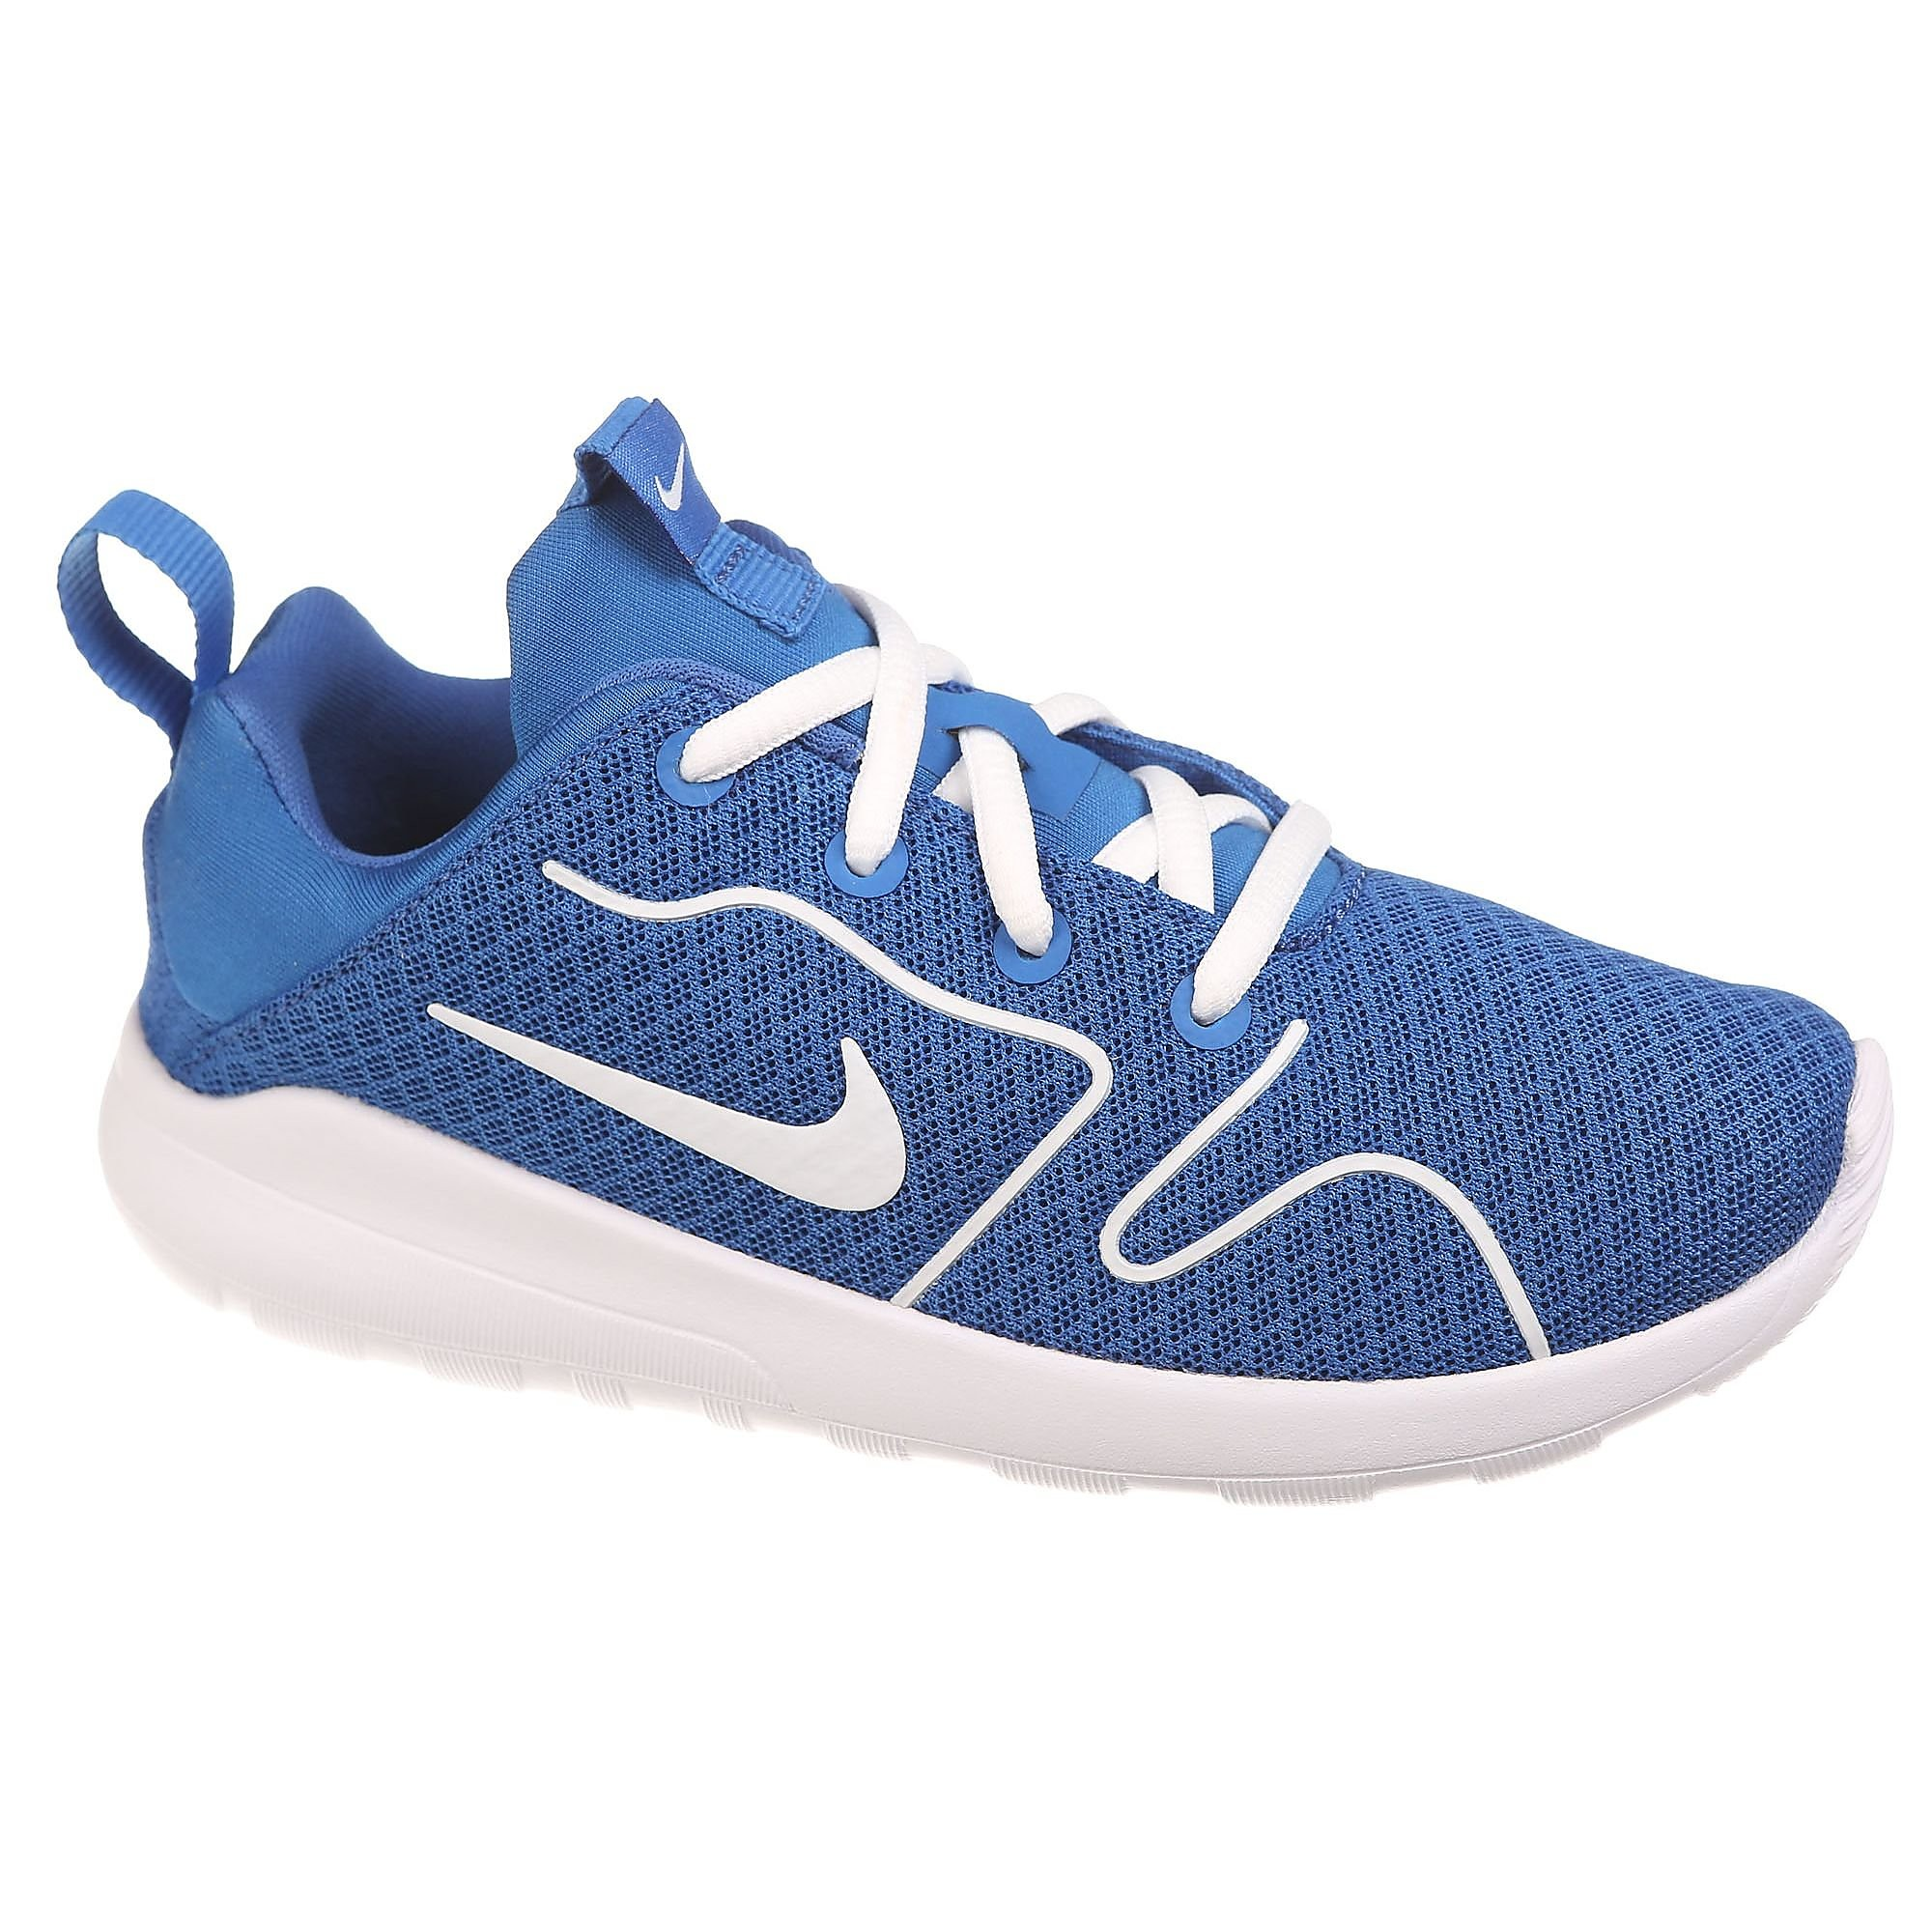 Nike KAISHI 2.0 JR